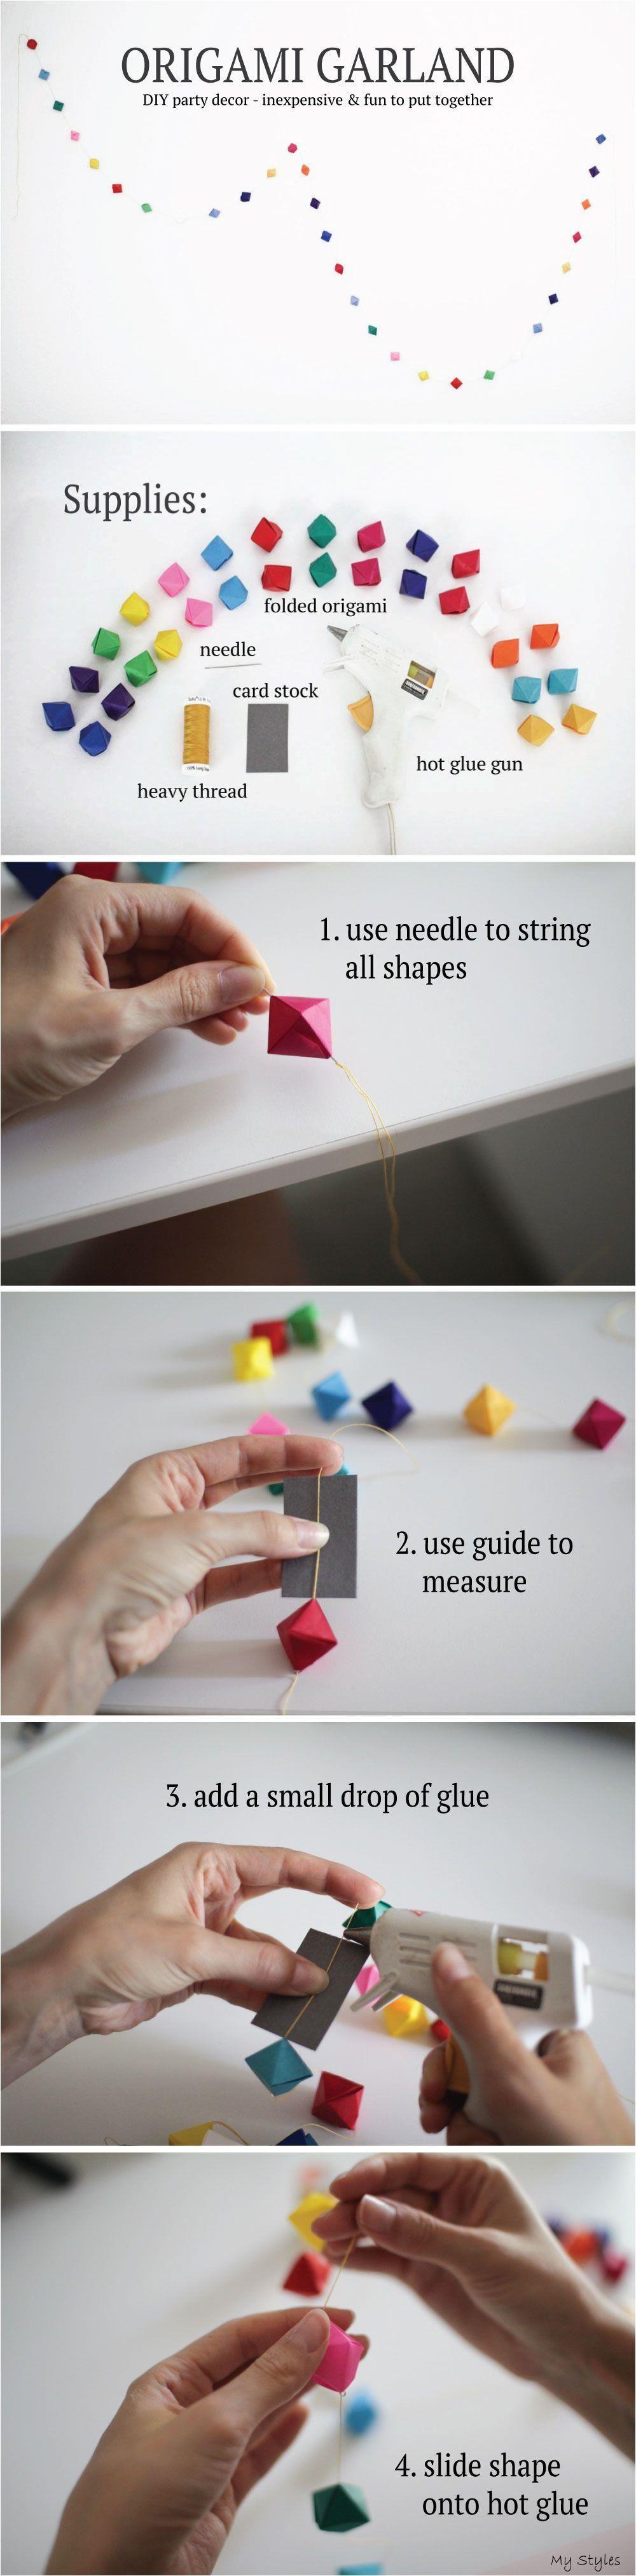 Photo of # 31458 #origami